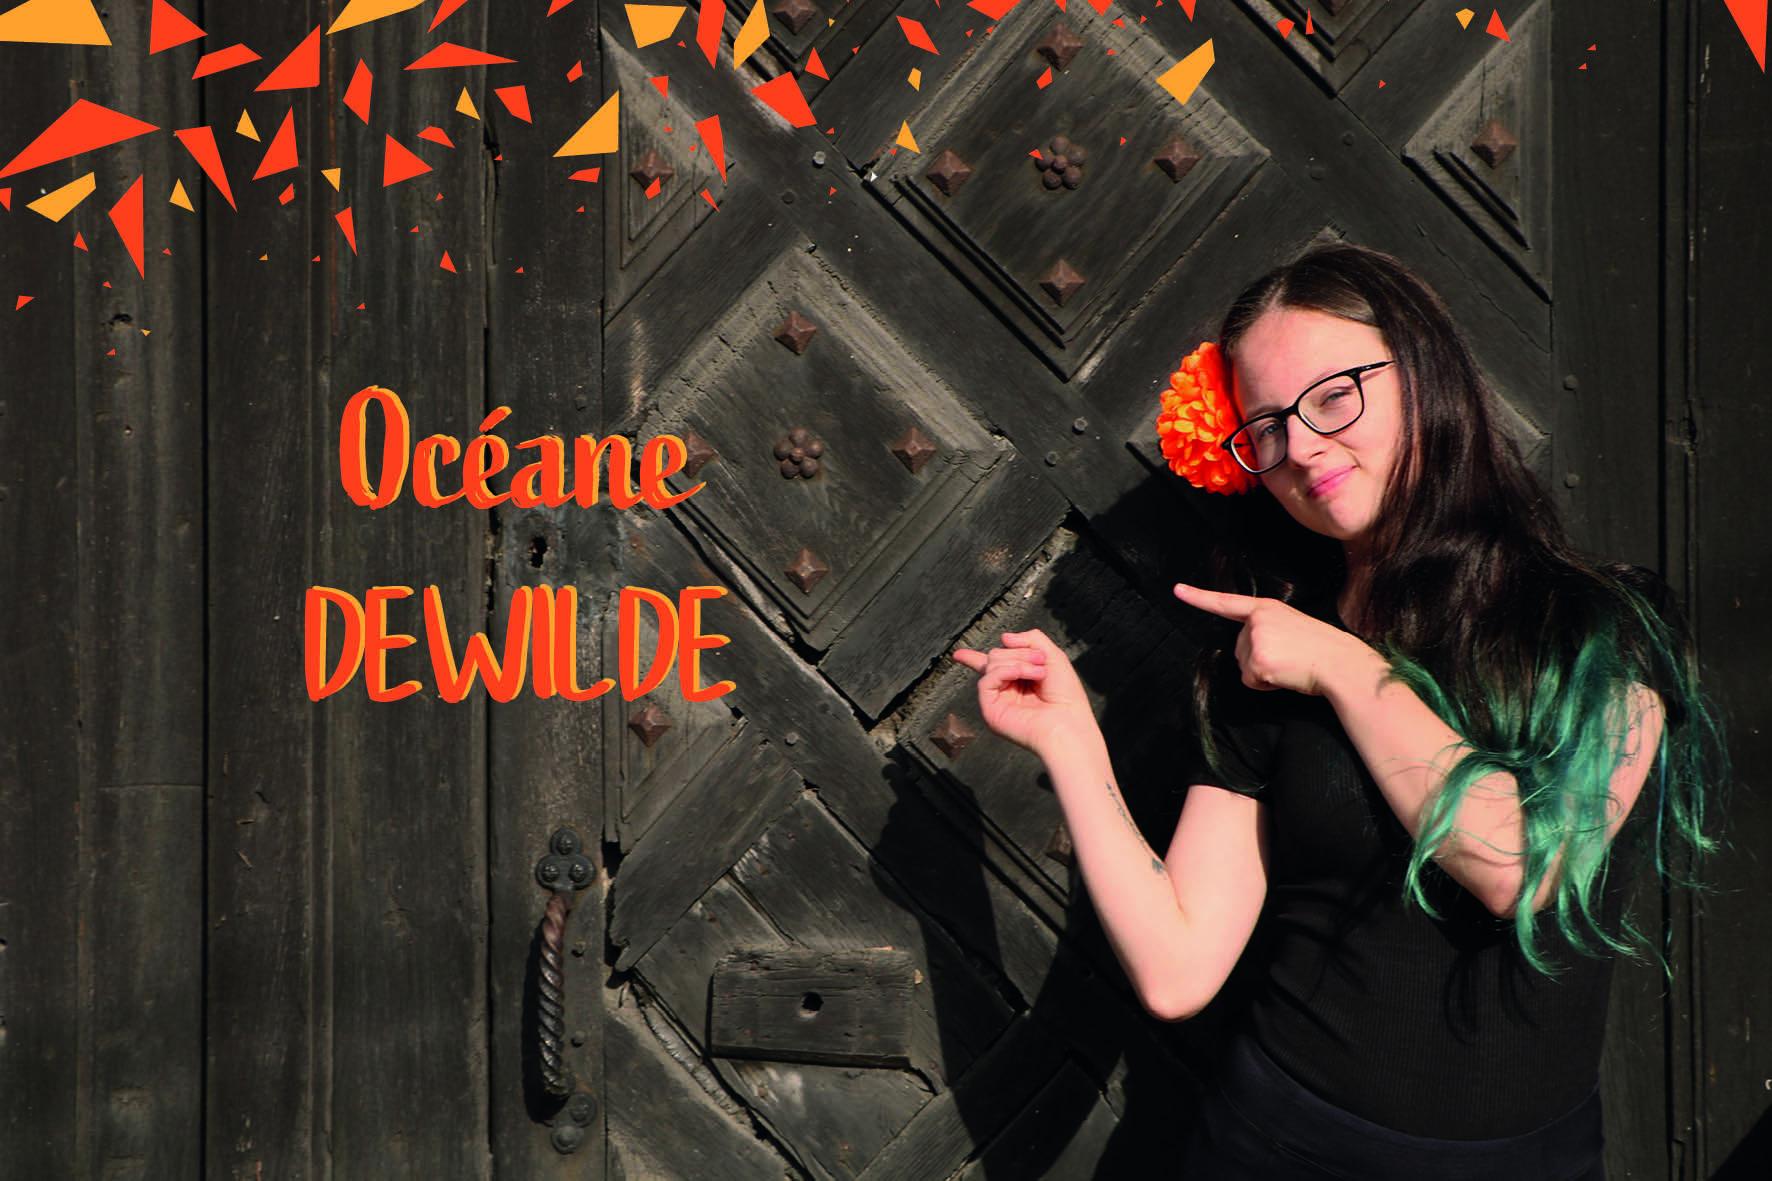 Océane Dewilde